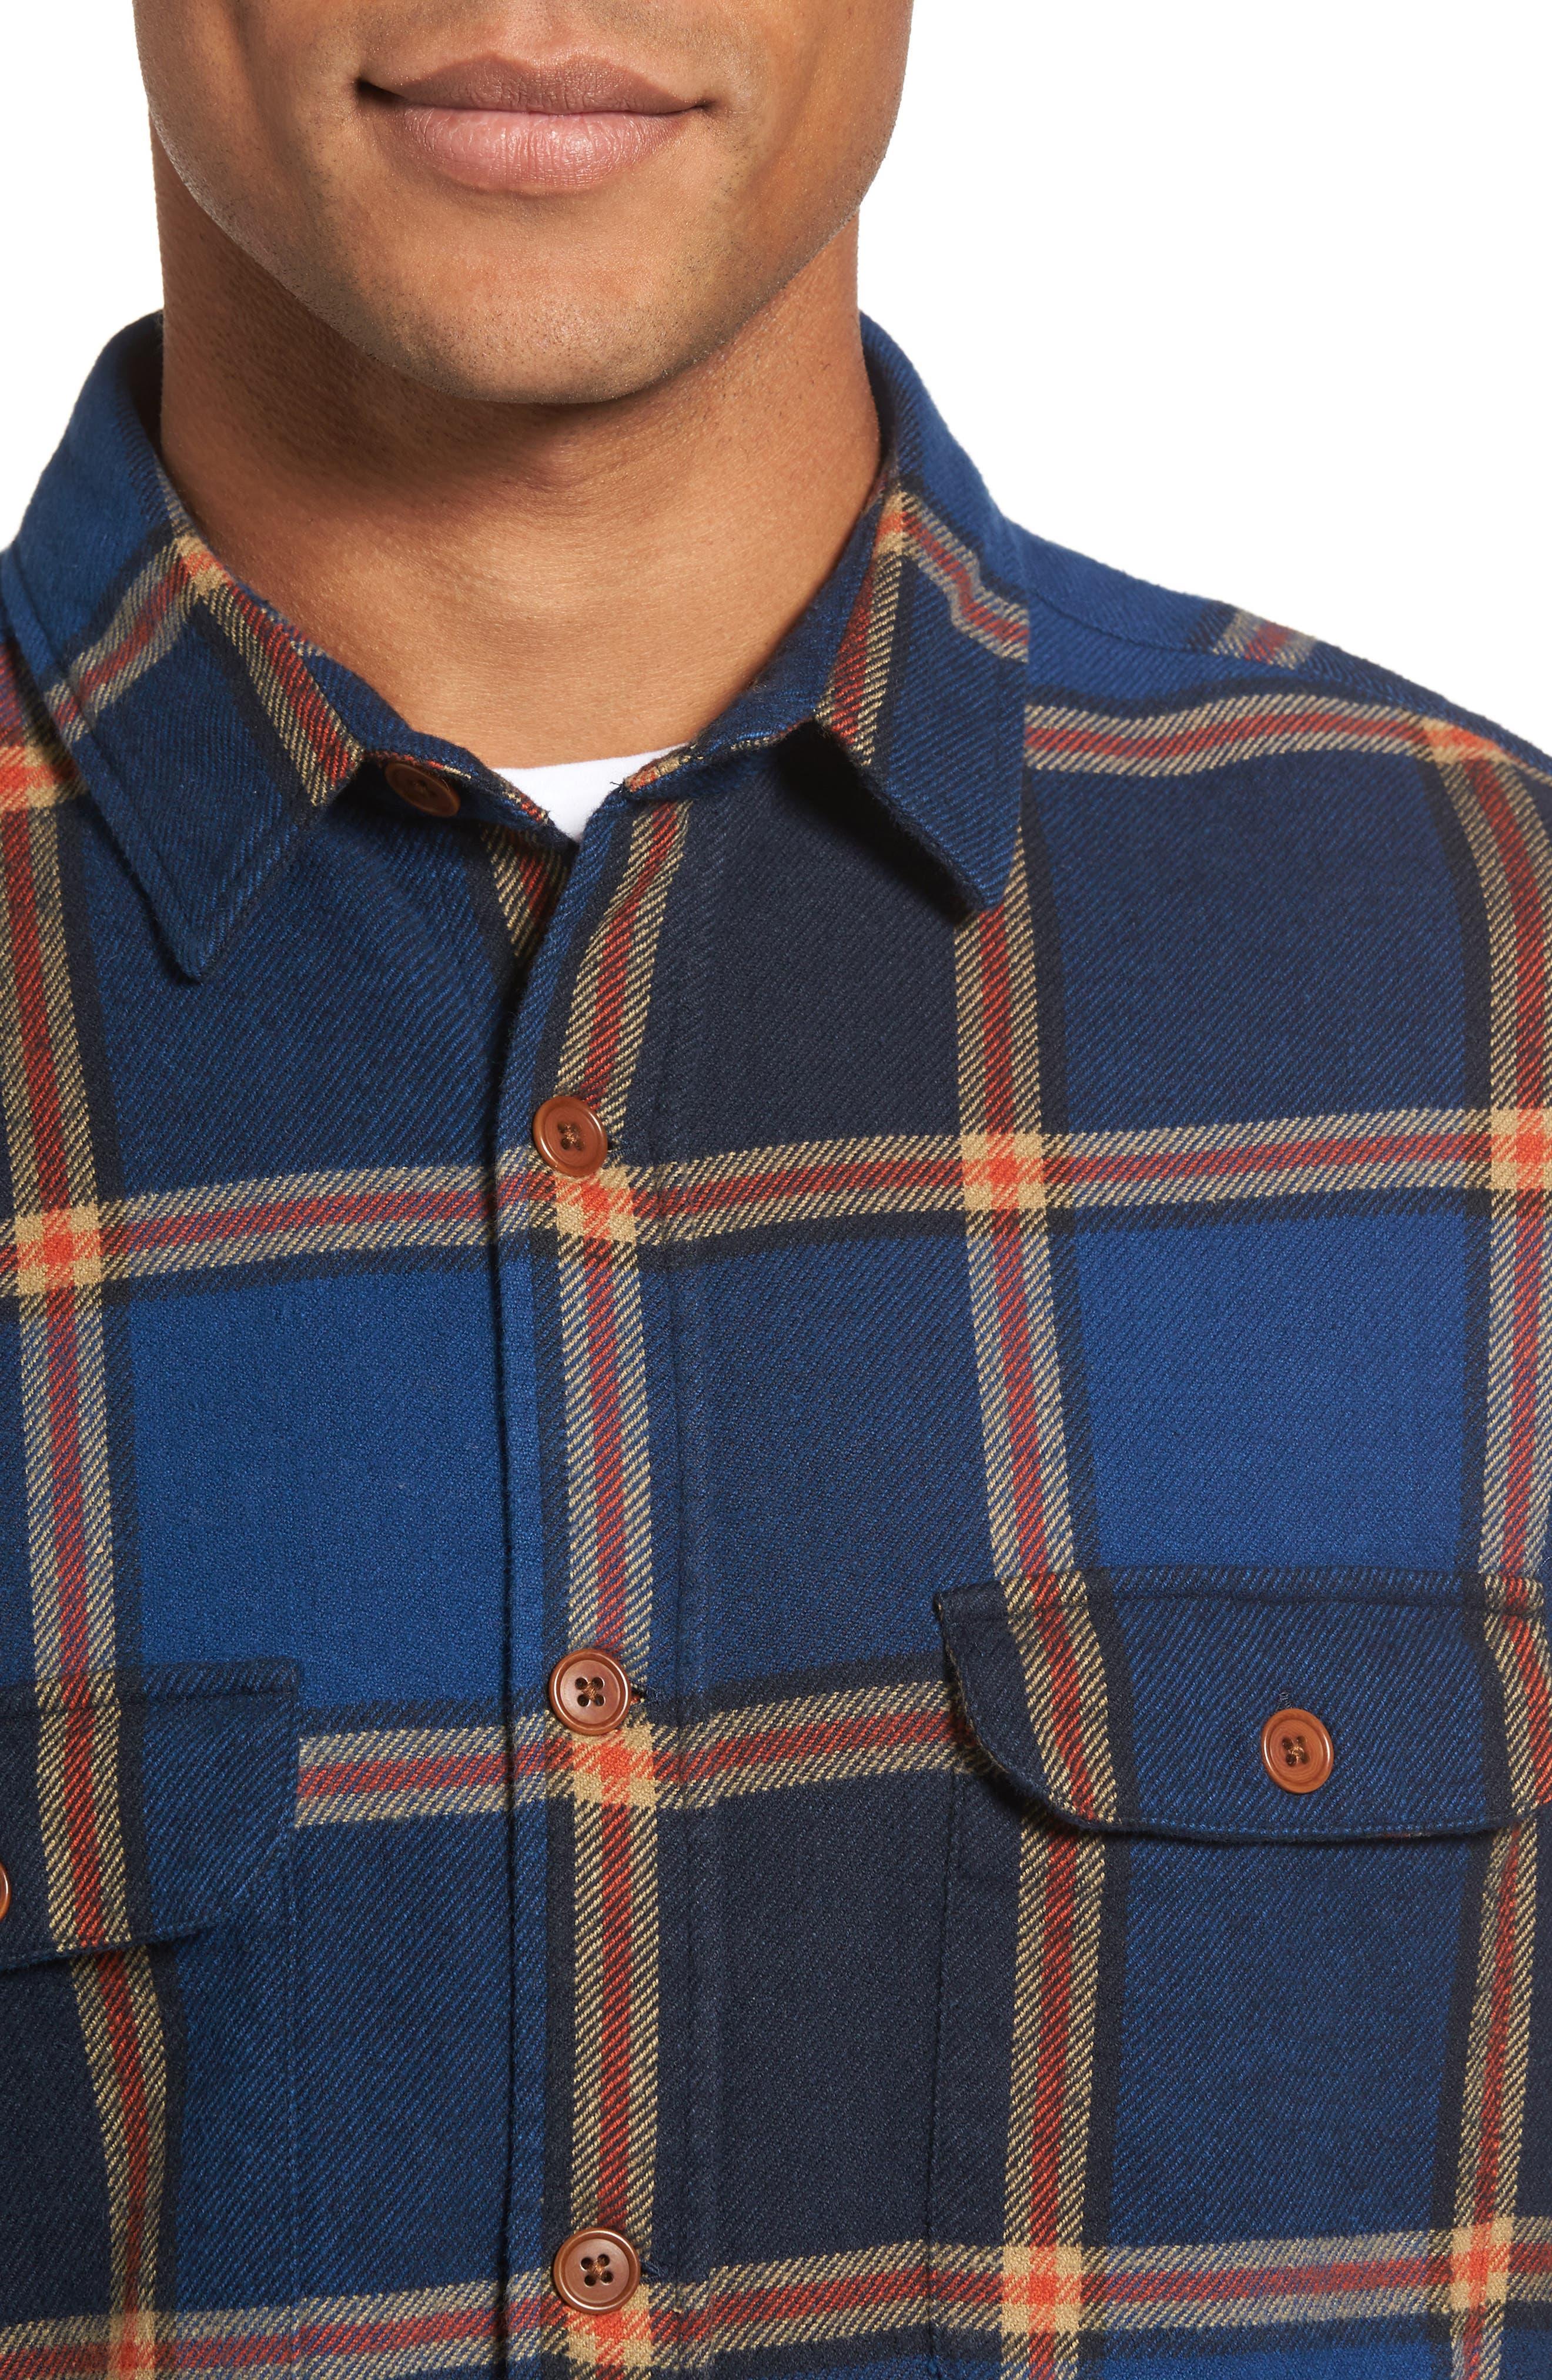 R1 Check Twill Shirt Jacket,                             Alternate thumbnail 4, color,                             410